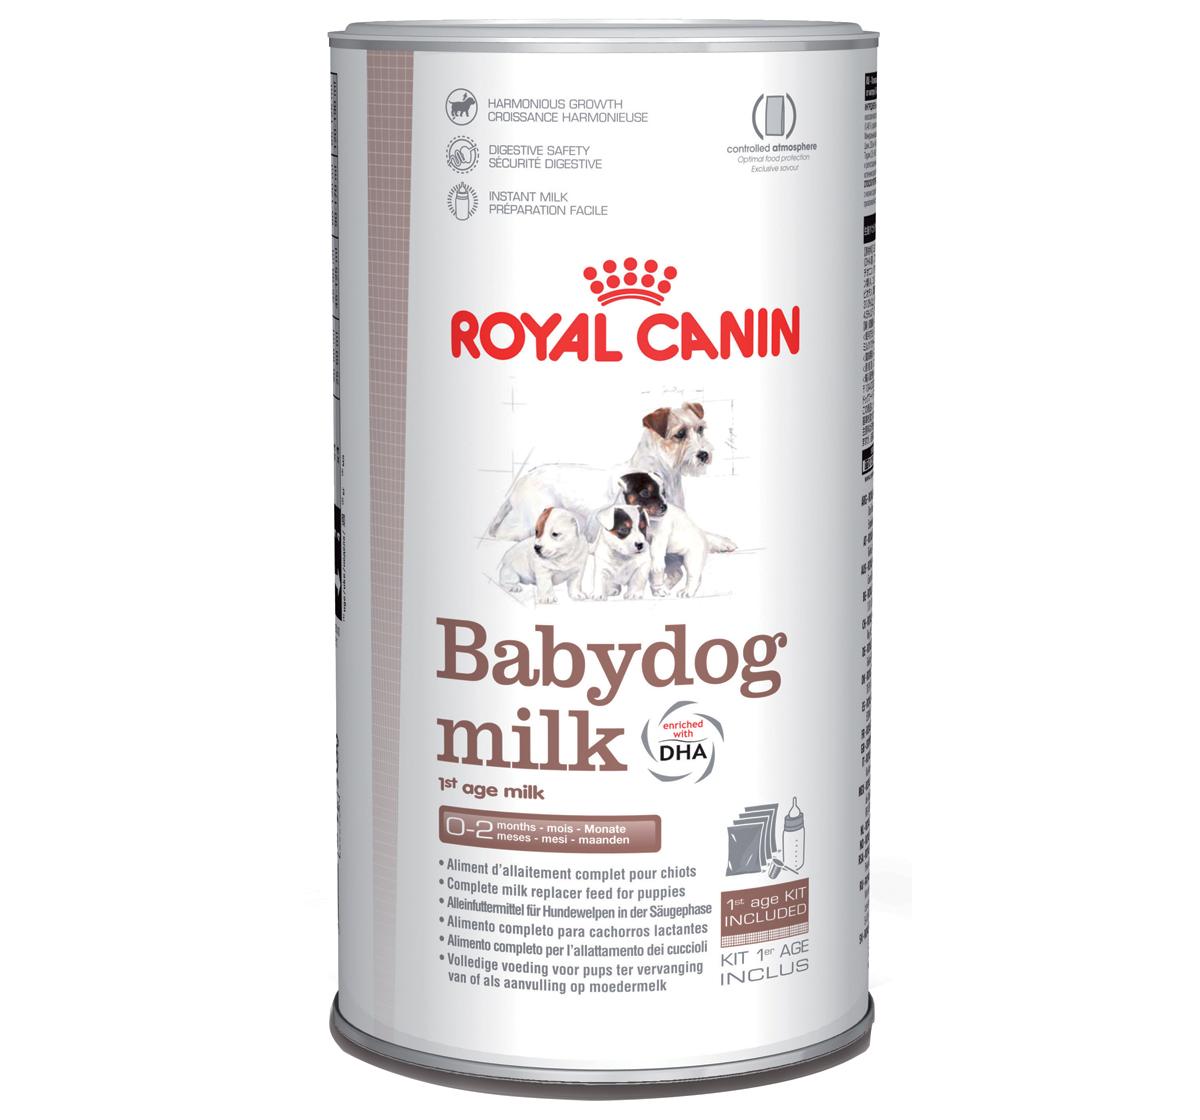 Royal Canin Babydog milk 0,4kg.